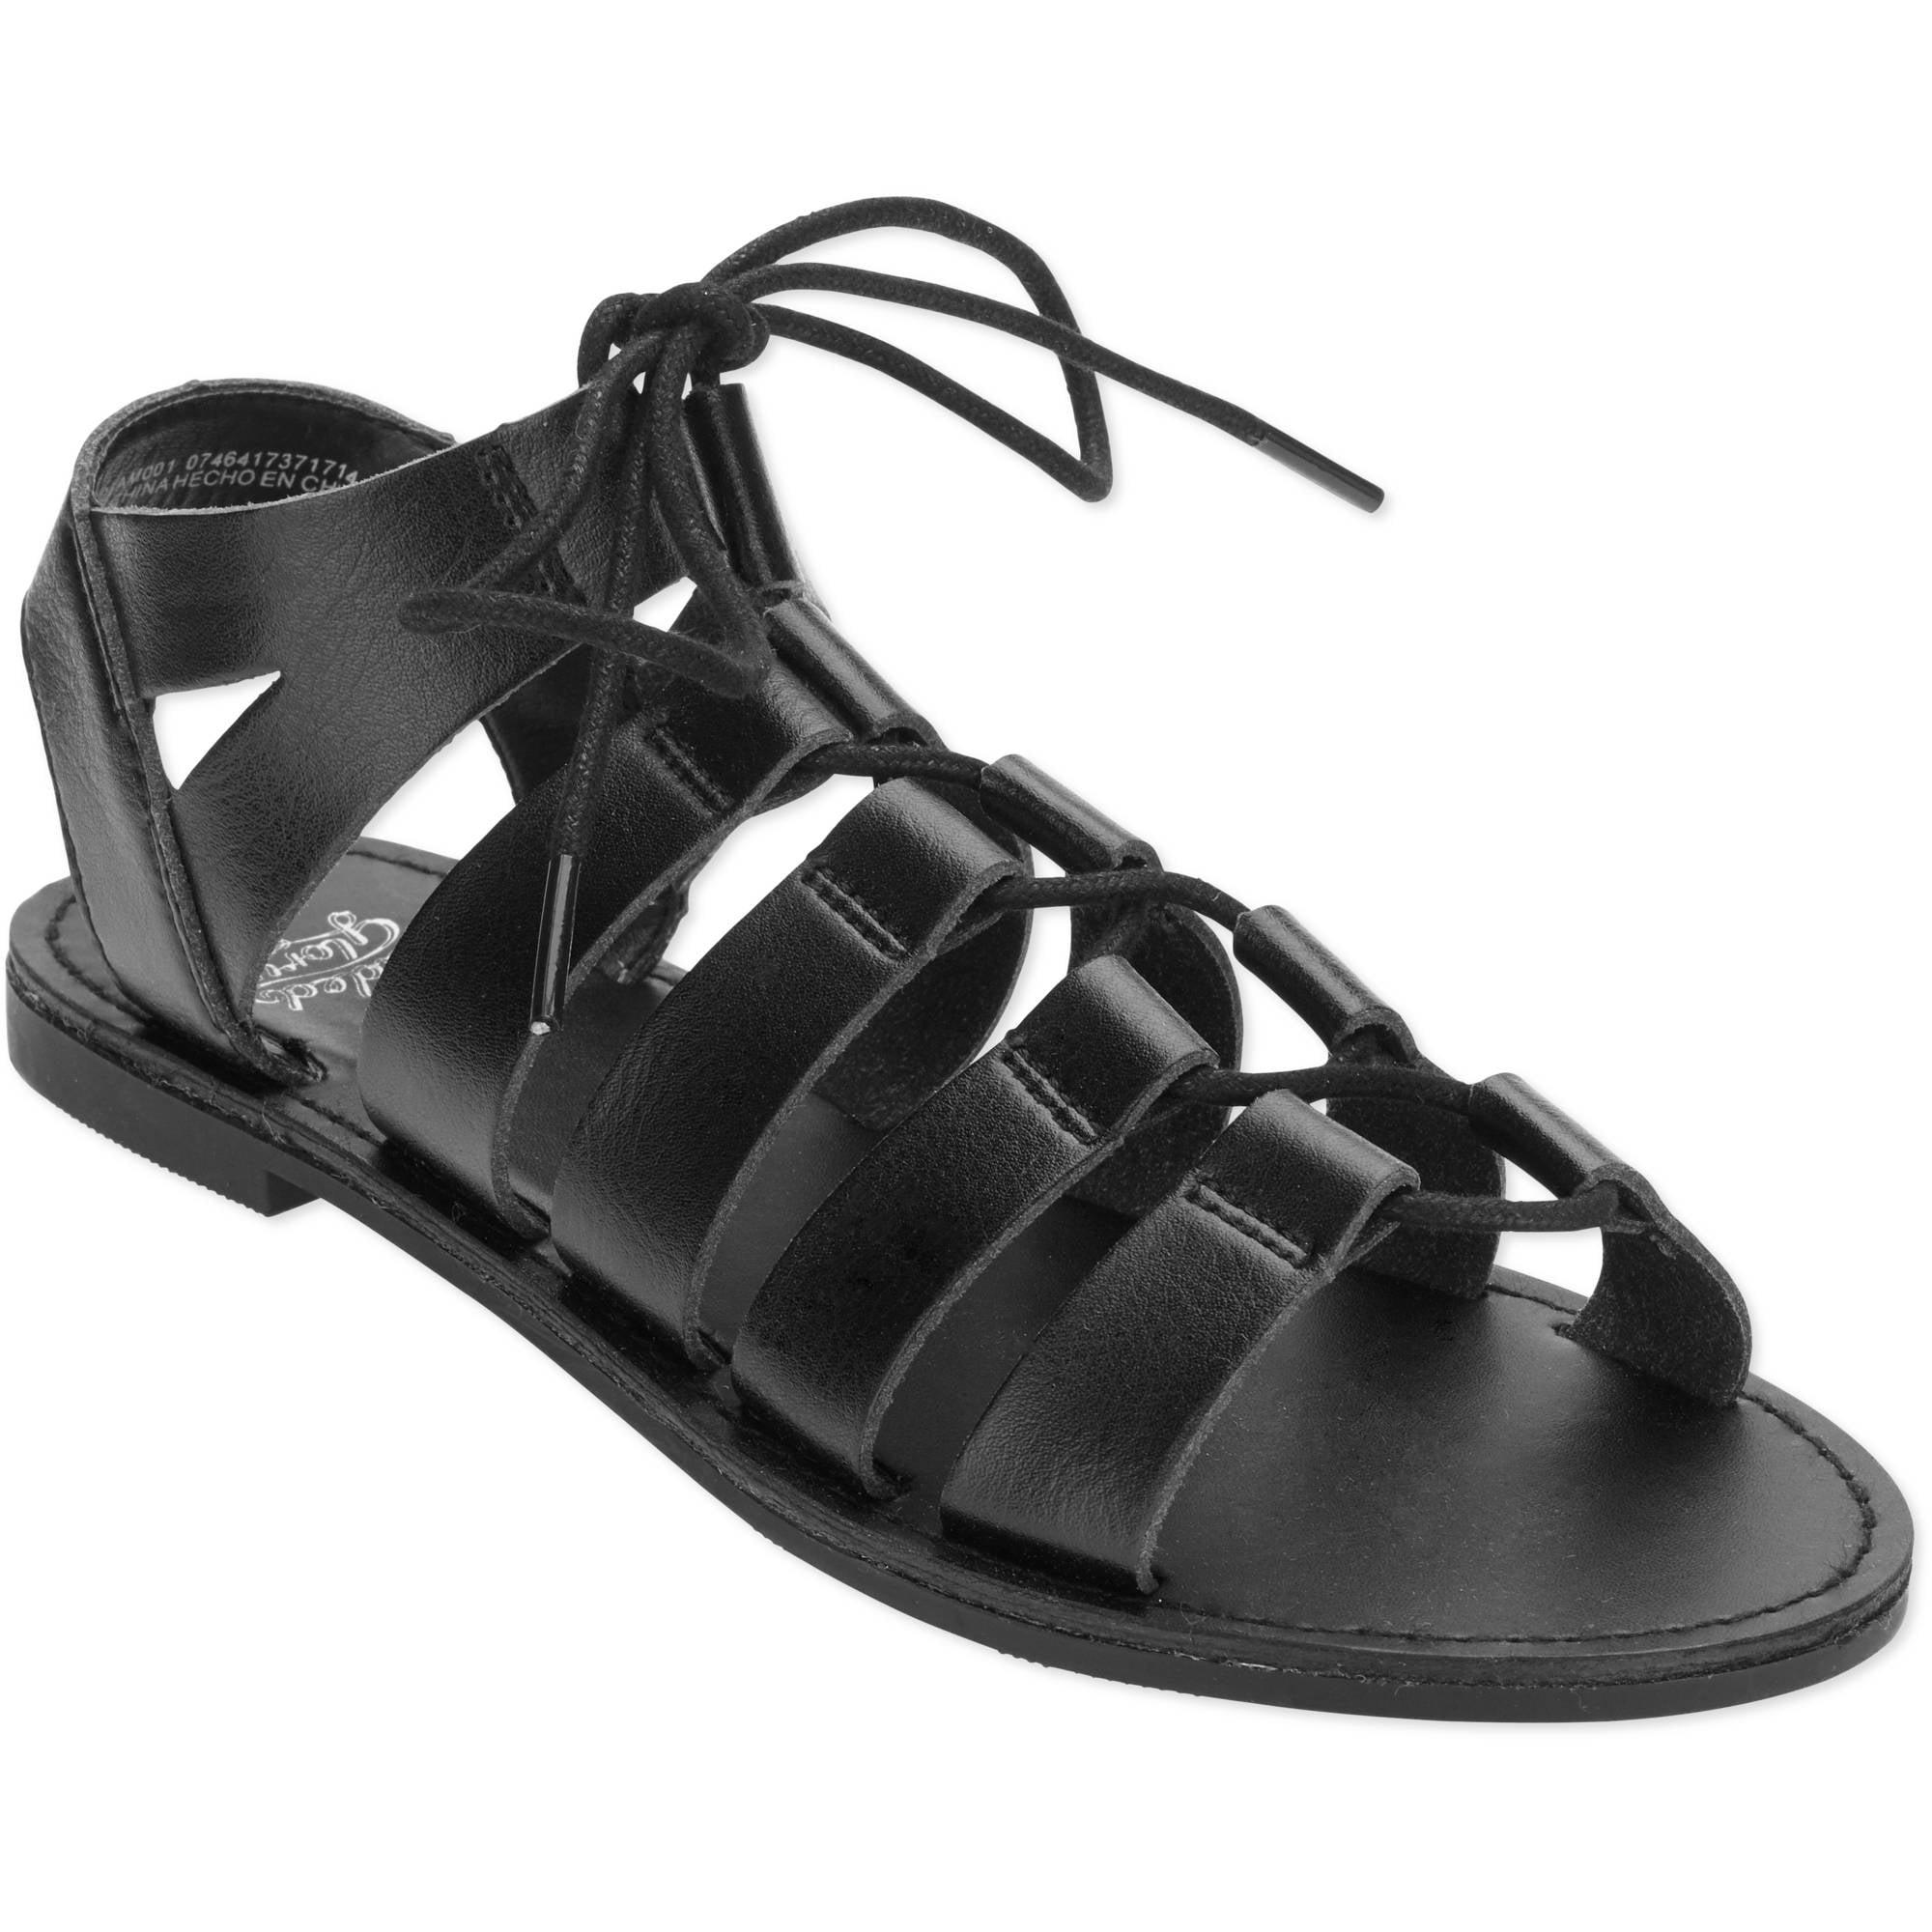 Black sandals at walmart - Black Sandals At Walmart 4